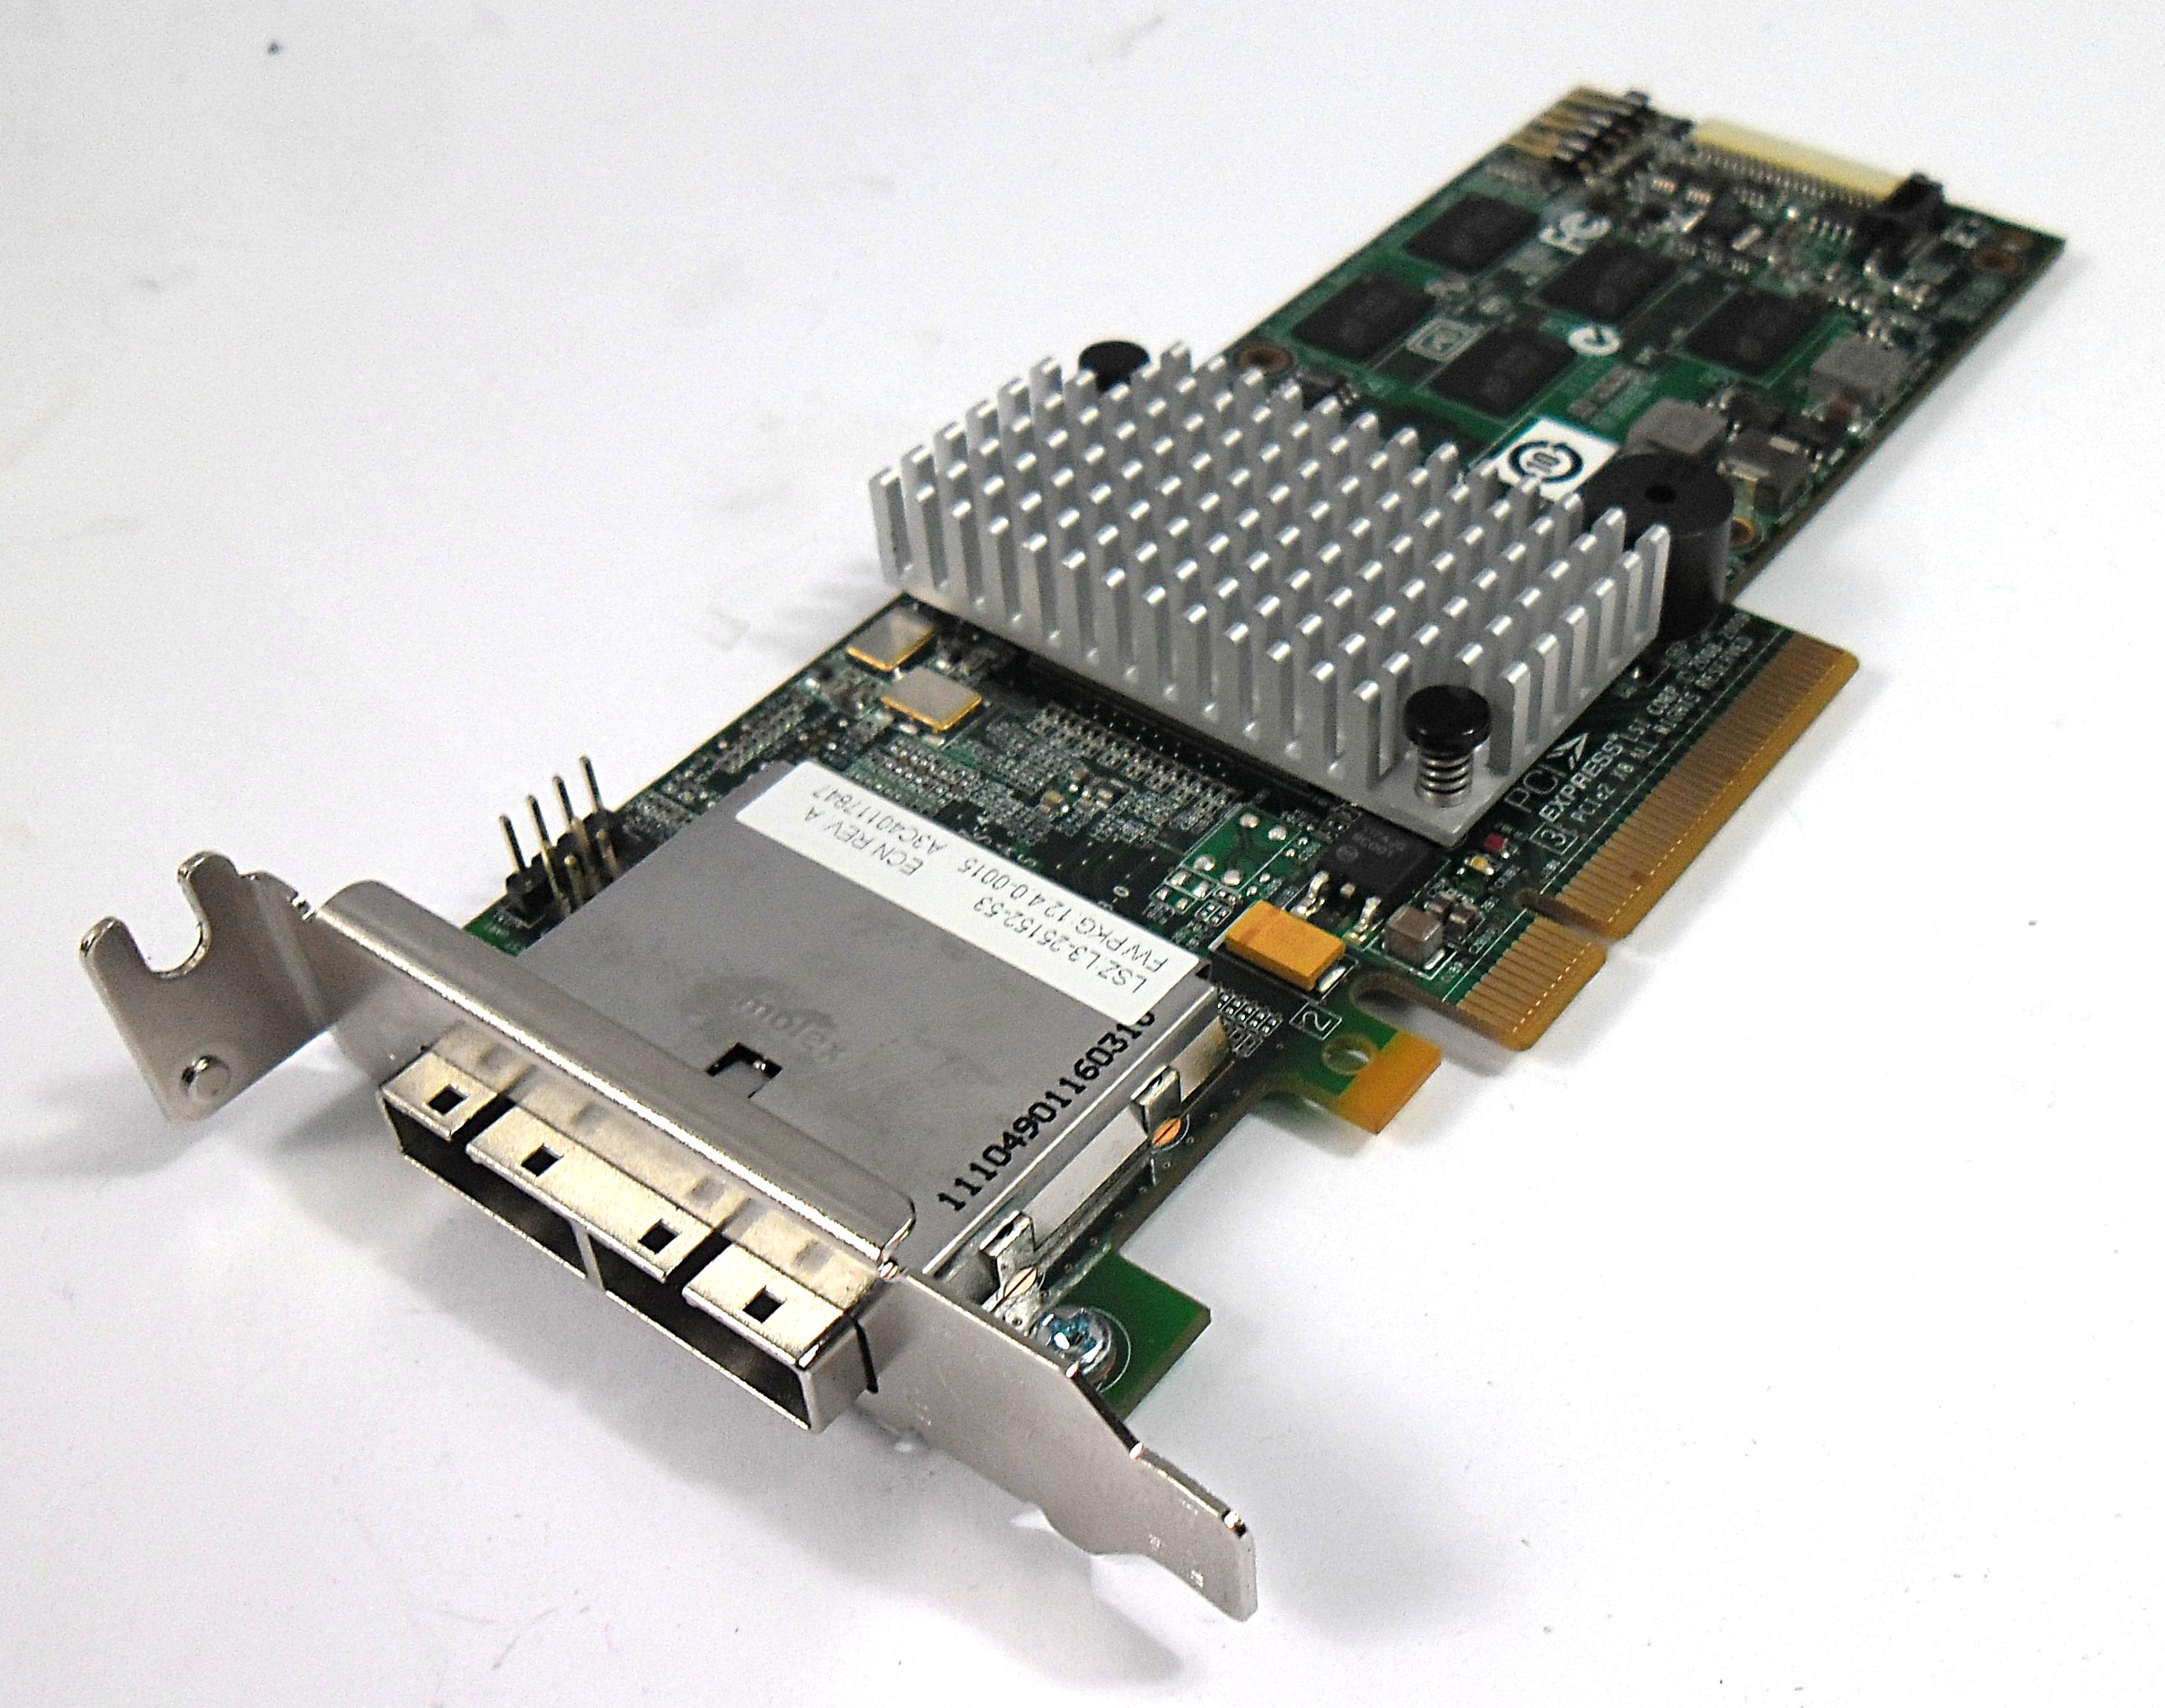 Fujitsu A3C40117847 L3-25152-53A PCIe SAS RAID Controller Card Low Profile